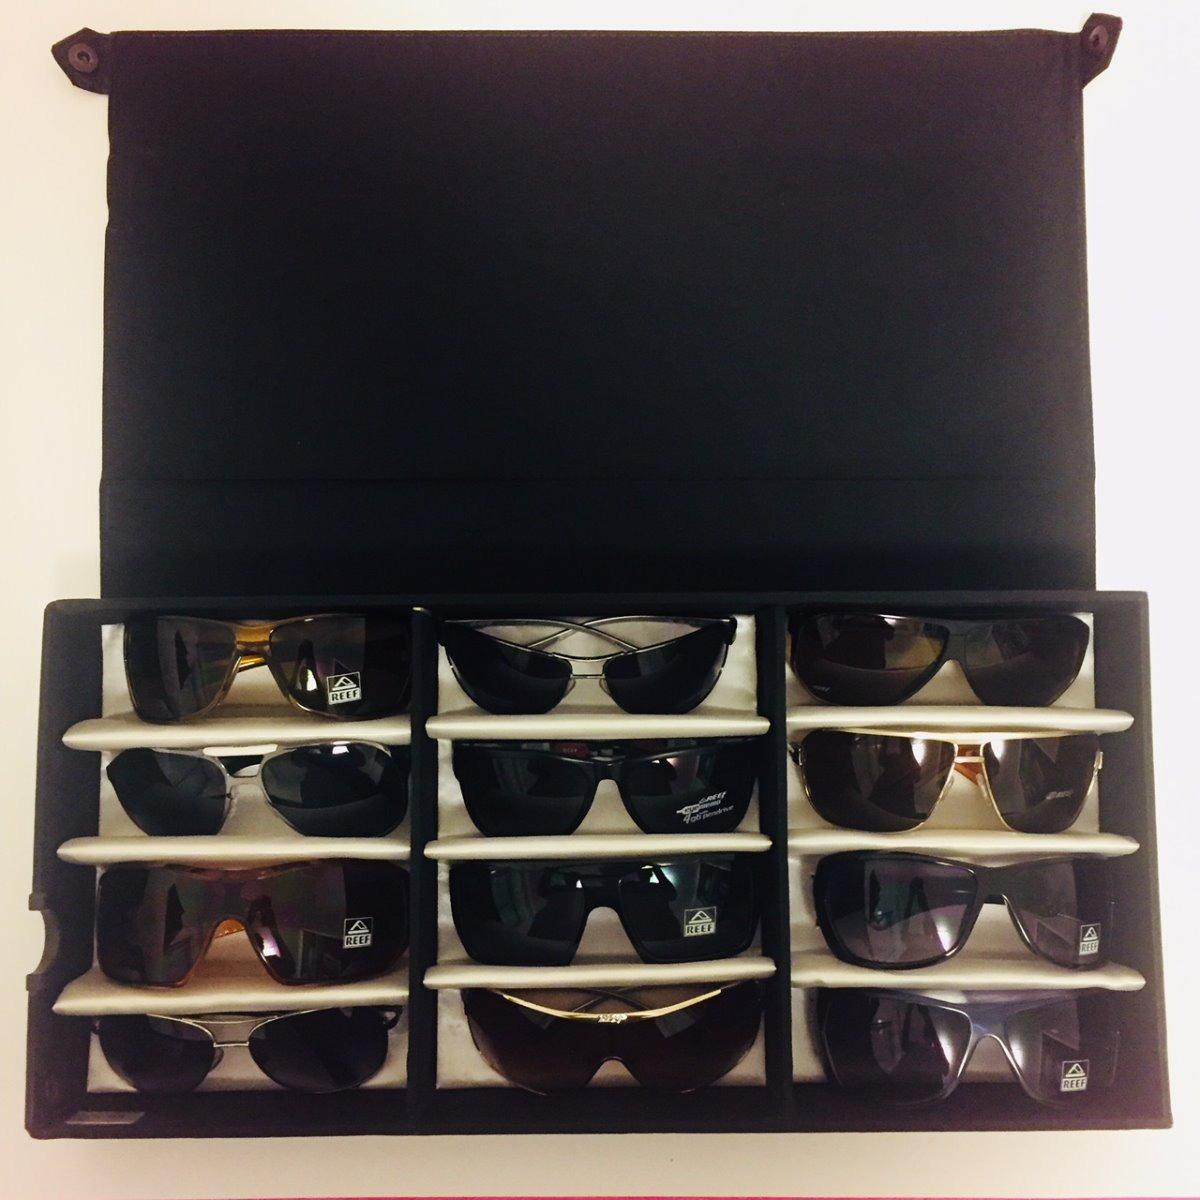 d19fe28a3 Bandeja Solar Curva 8 Nicho Expositor Organizador 12 Óculos - R$ 19,90 em  Mercado Livre